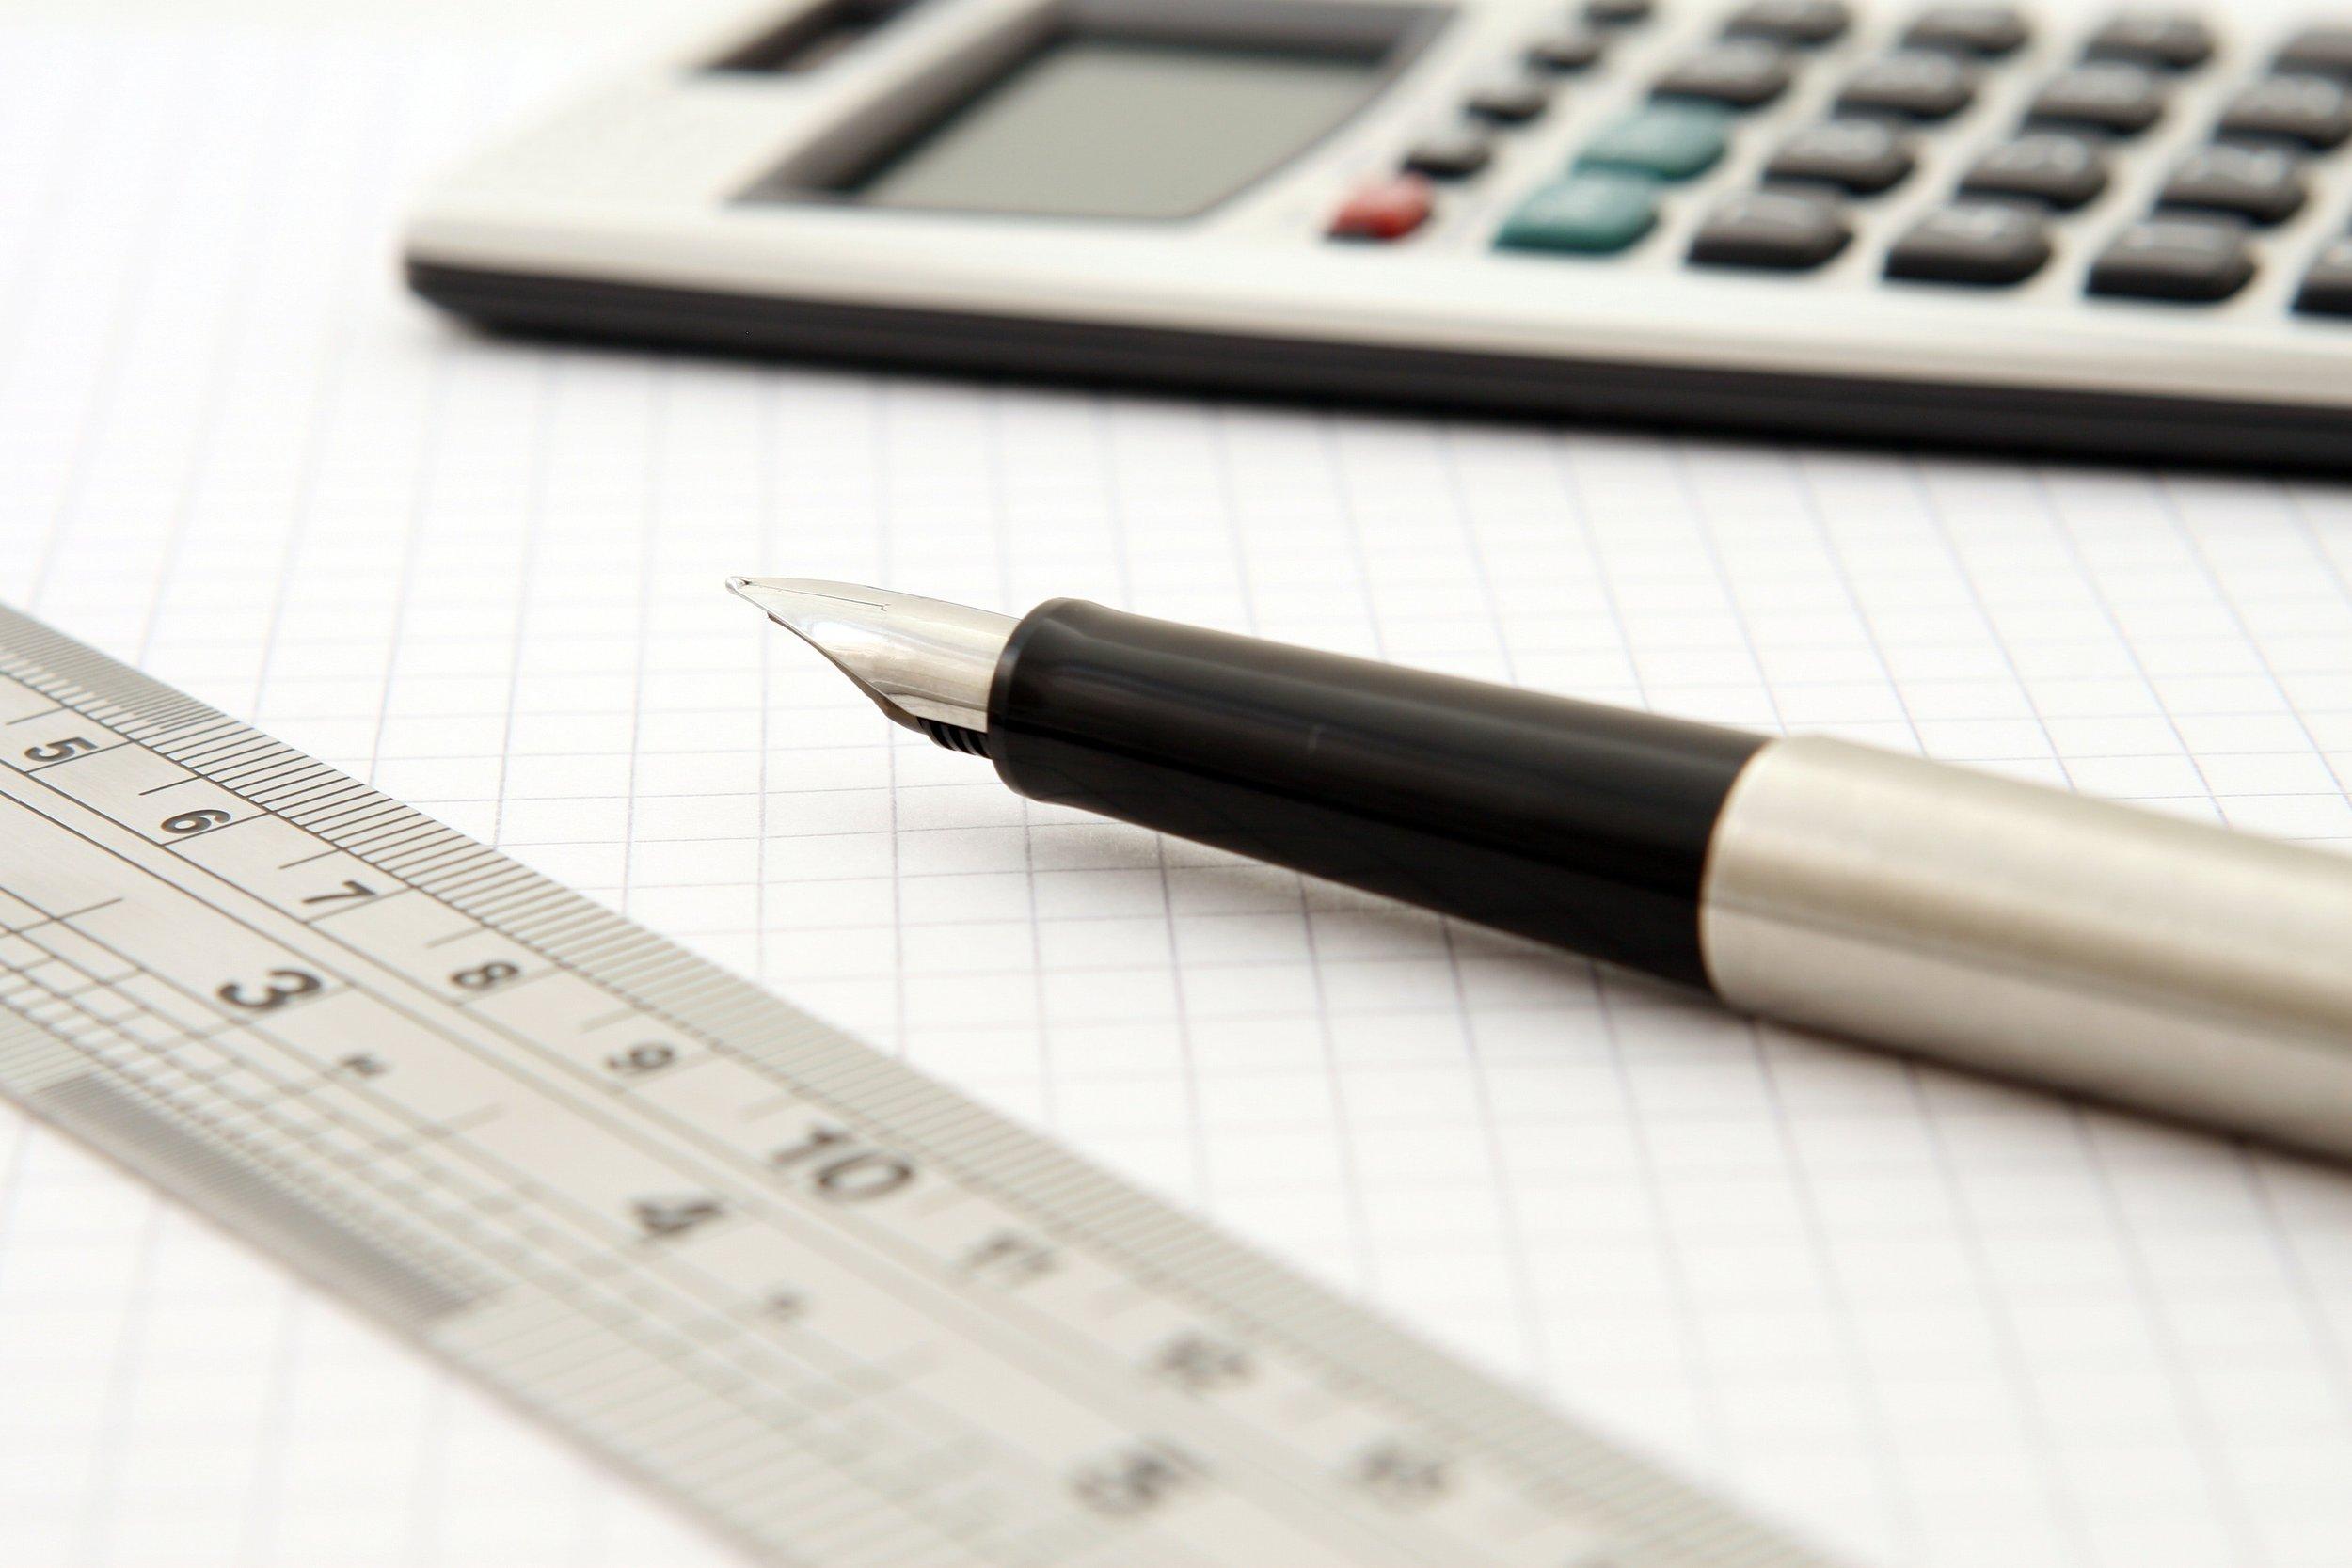 calculator-close-up-fountain-pen-159722.jpg